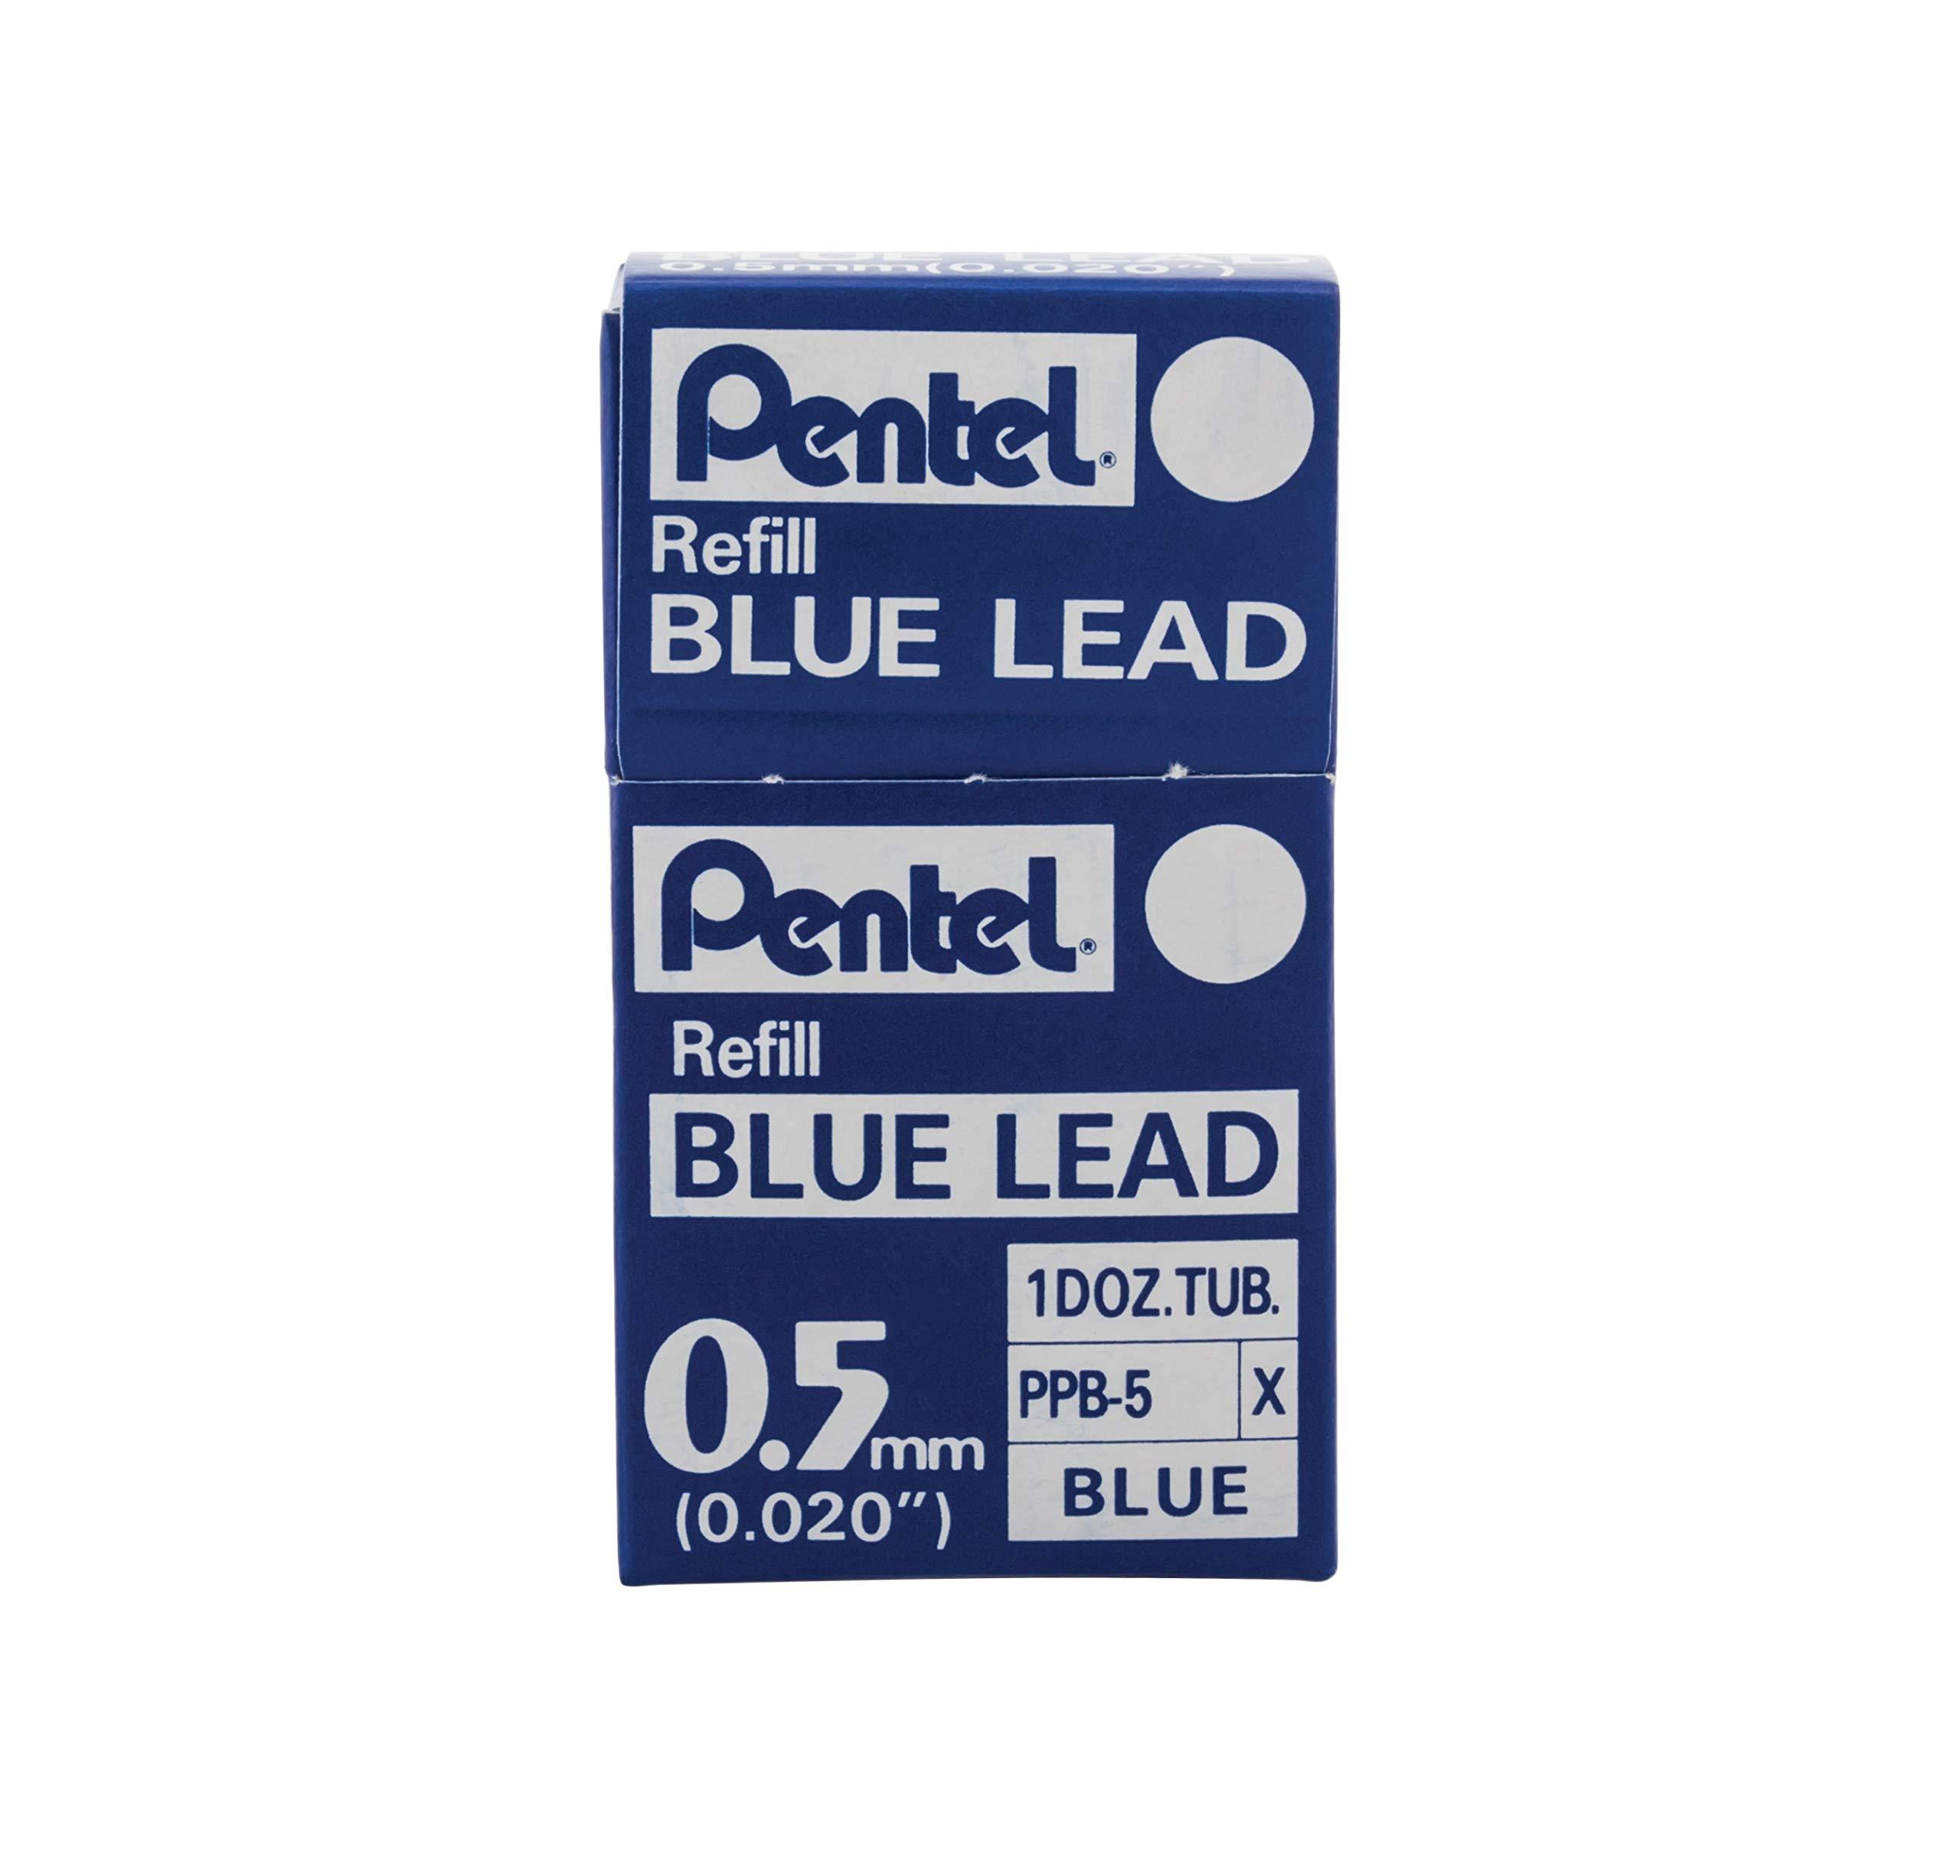 Pentel Refill Lead Blue (0.5mm) Medium 12 Pcs/Tube, 12 Tubes of Lead (PPB-5) by Pentel (Image #3)